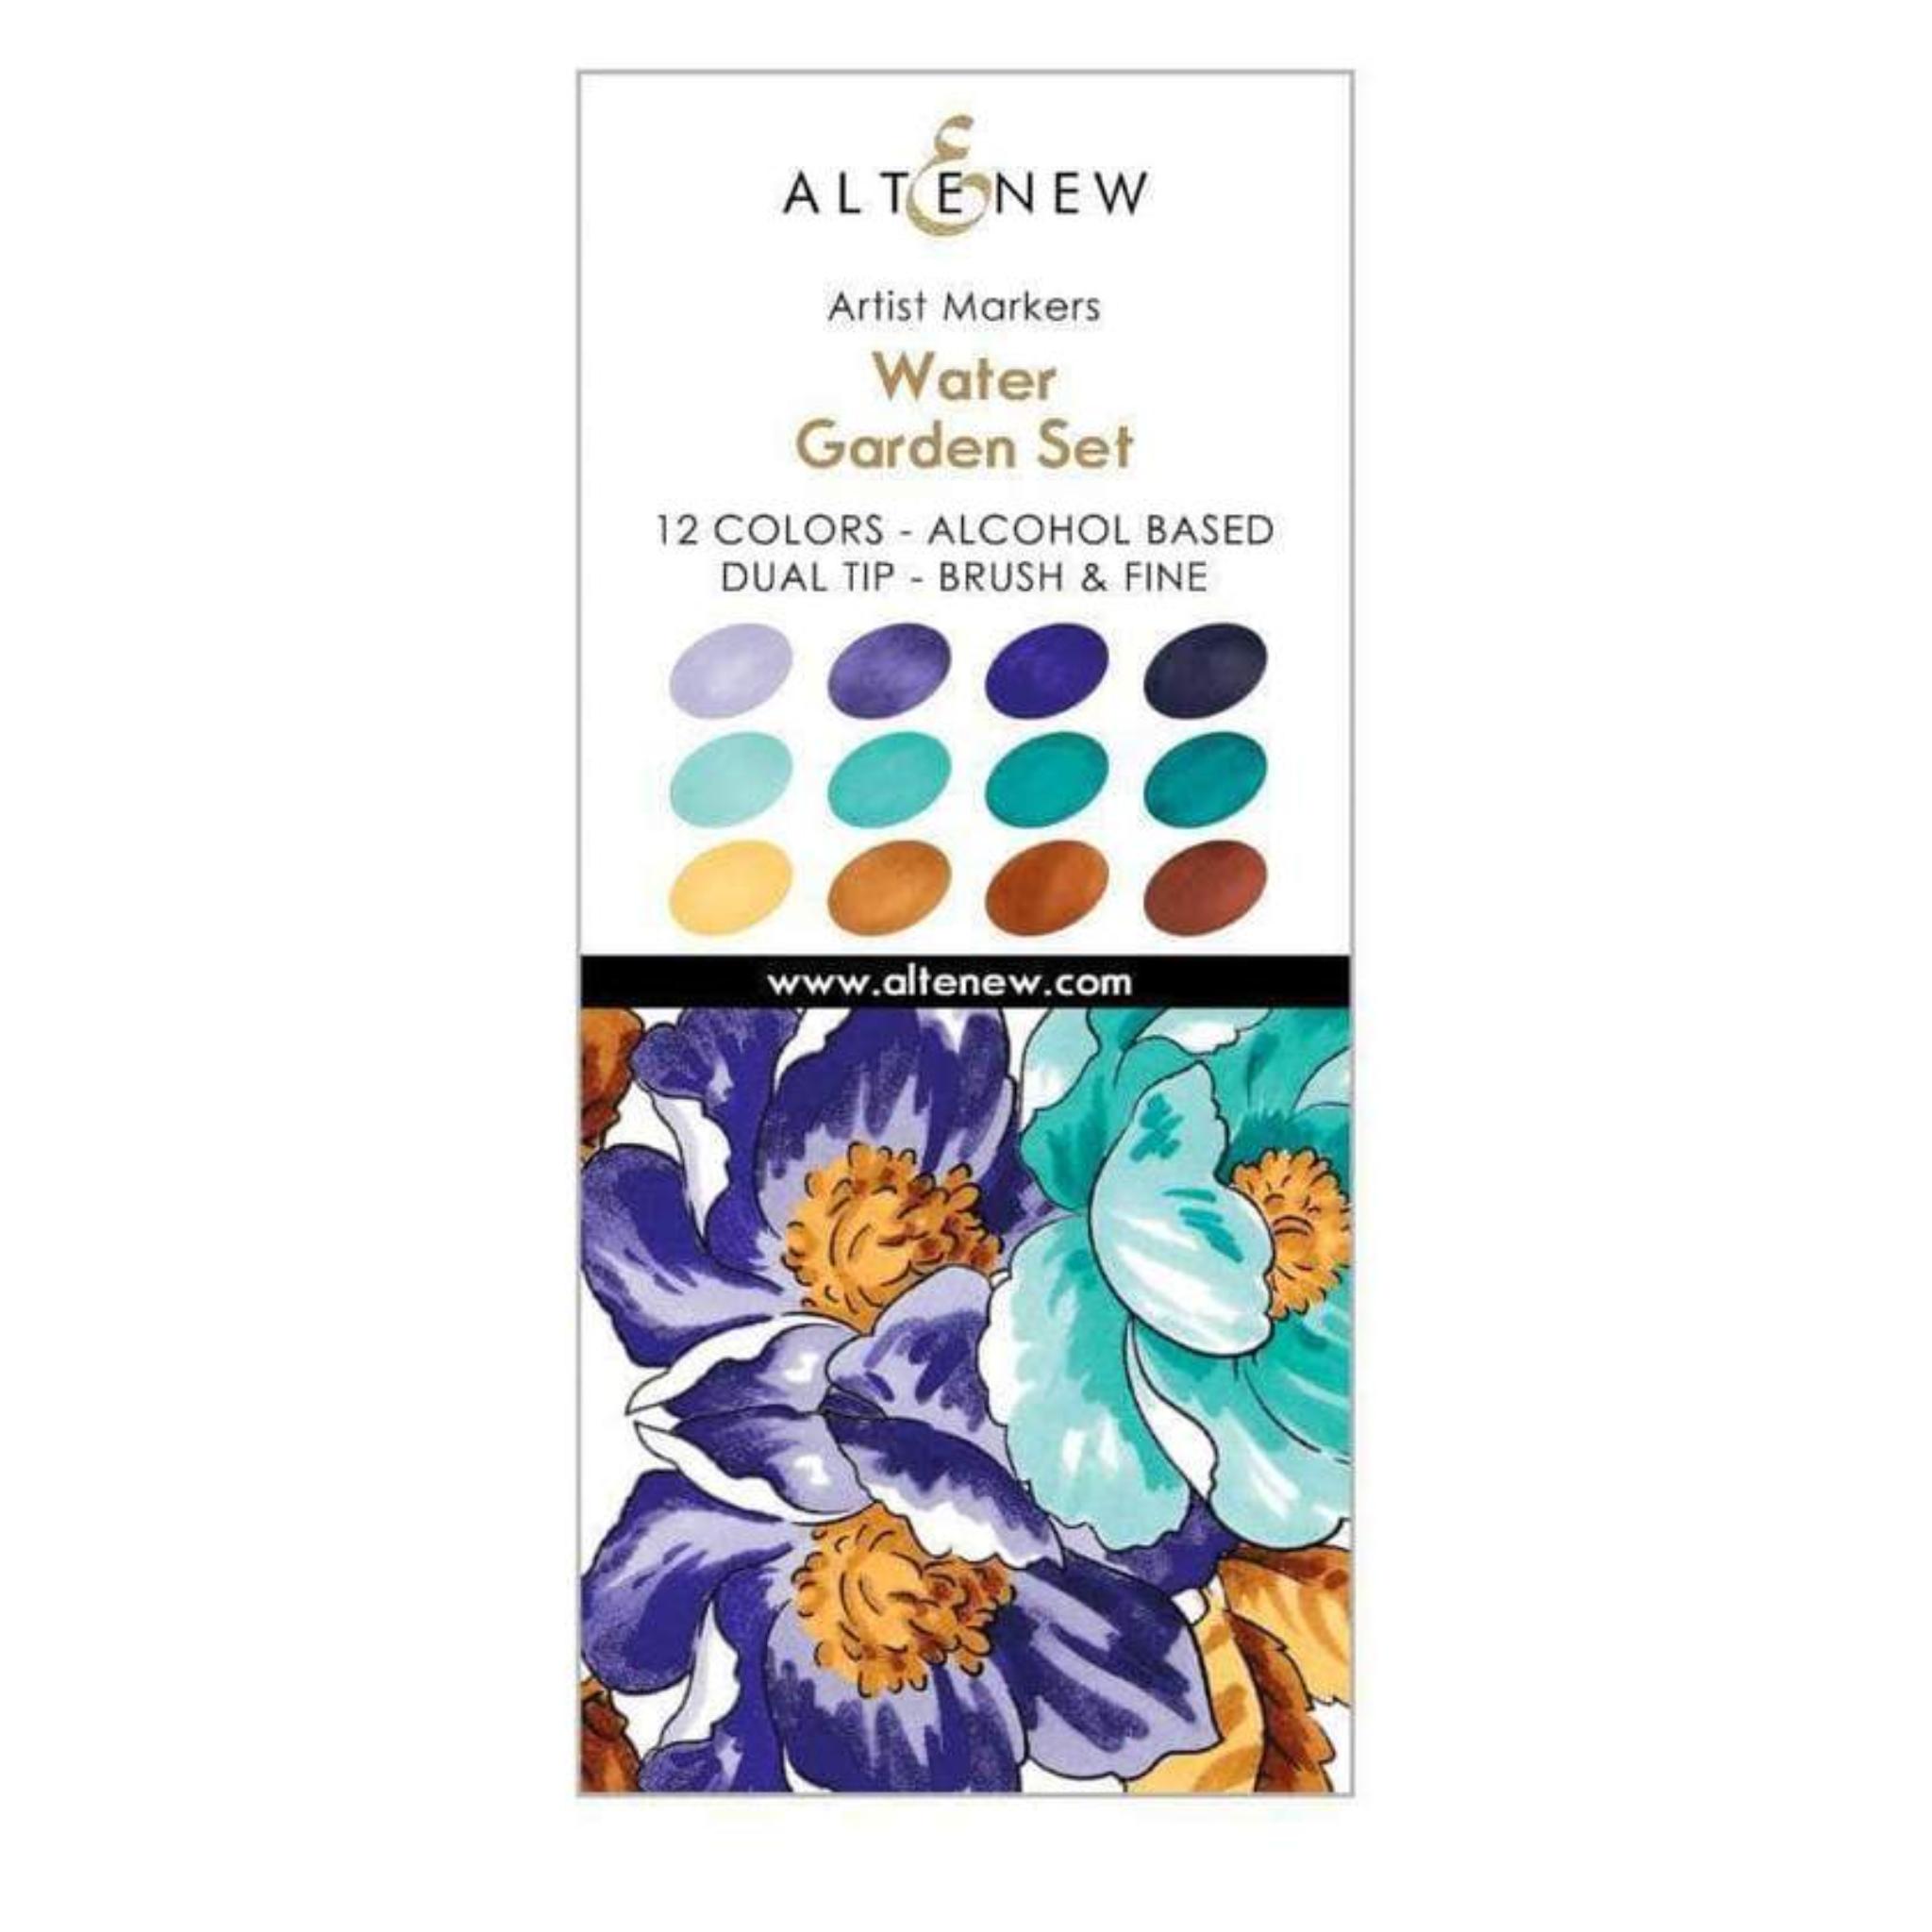 Water Garden Artist Markers